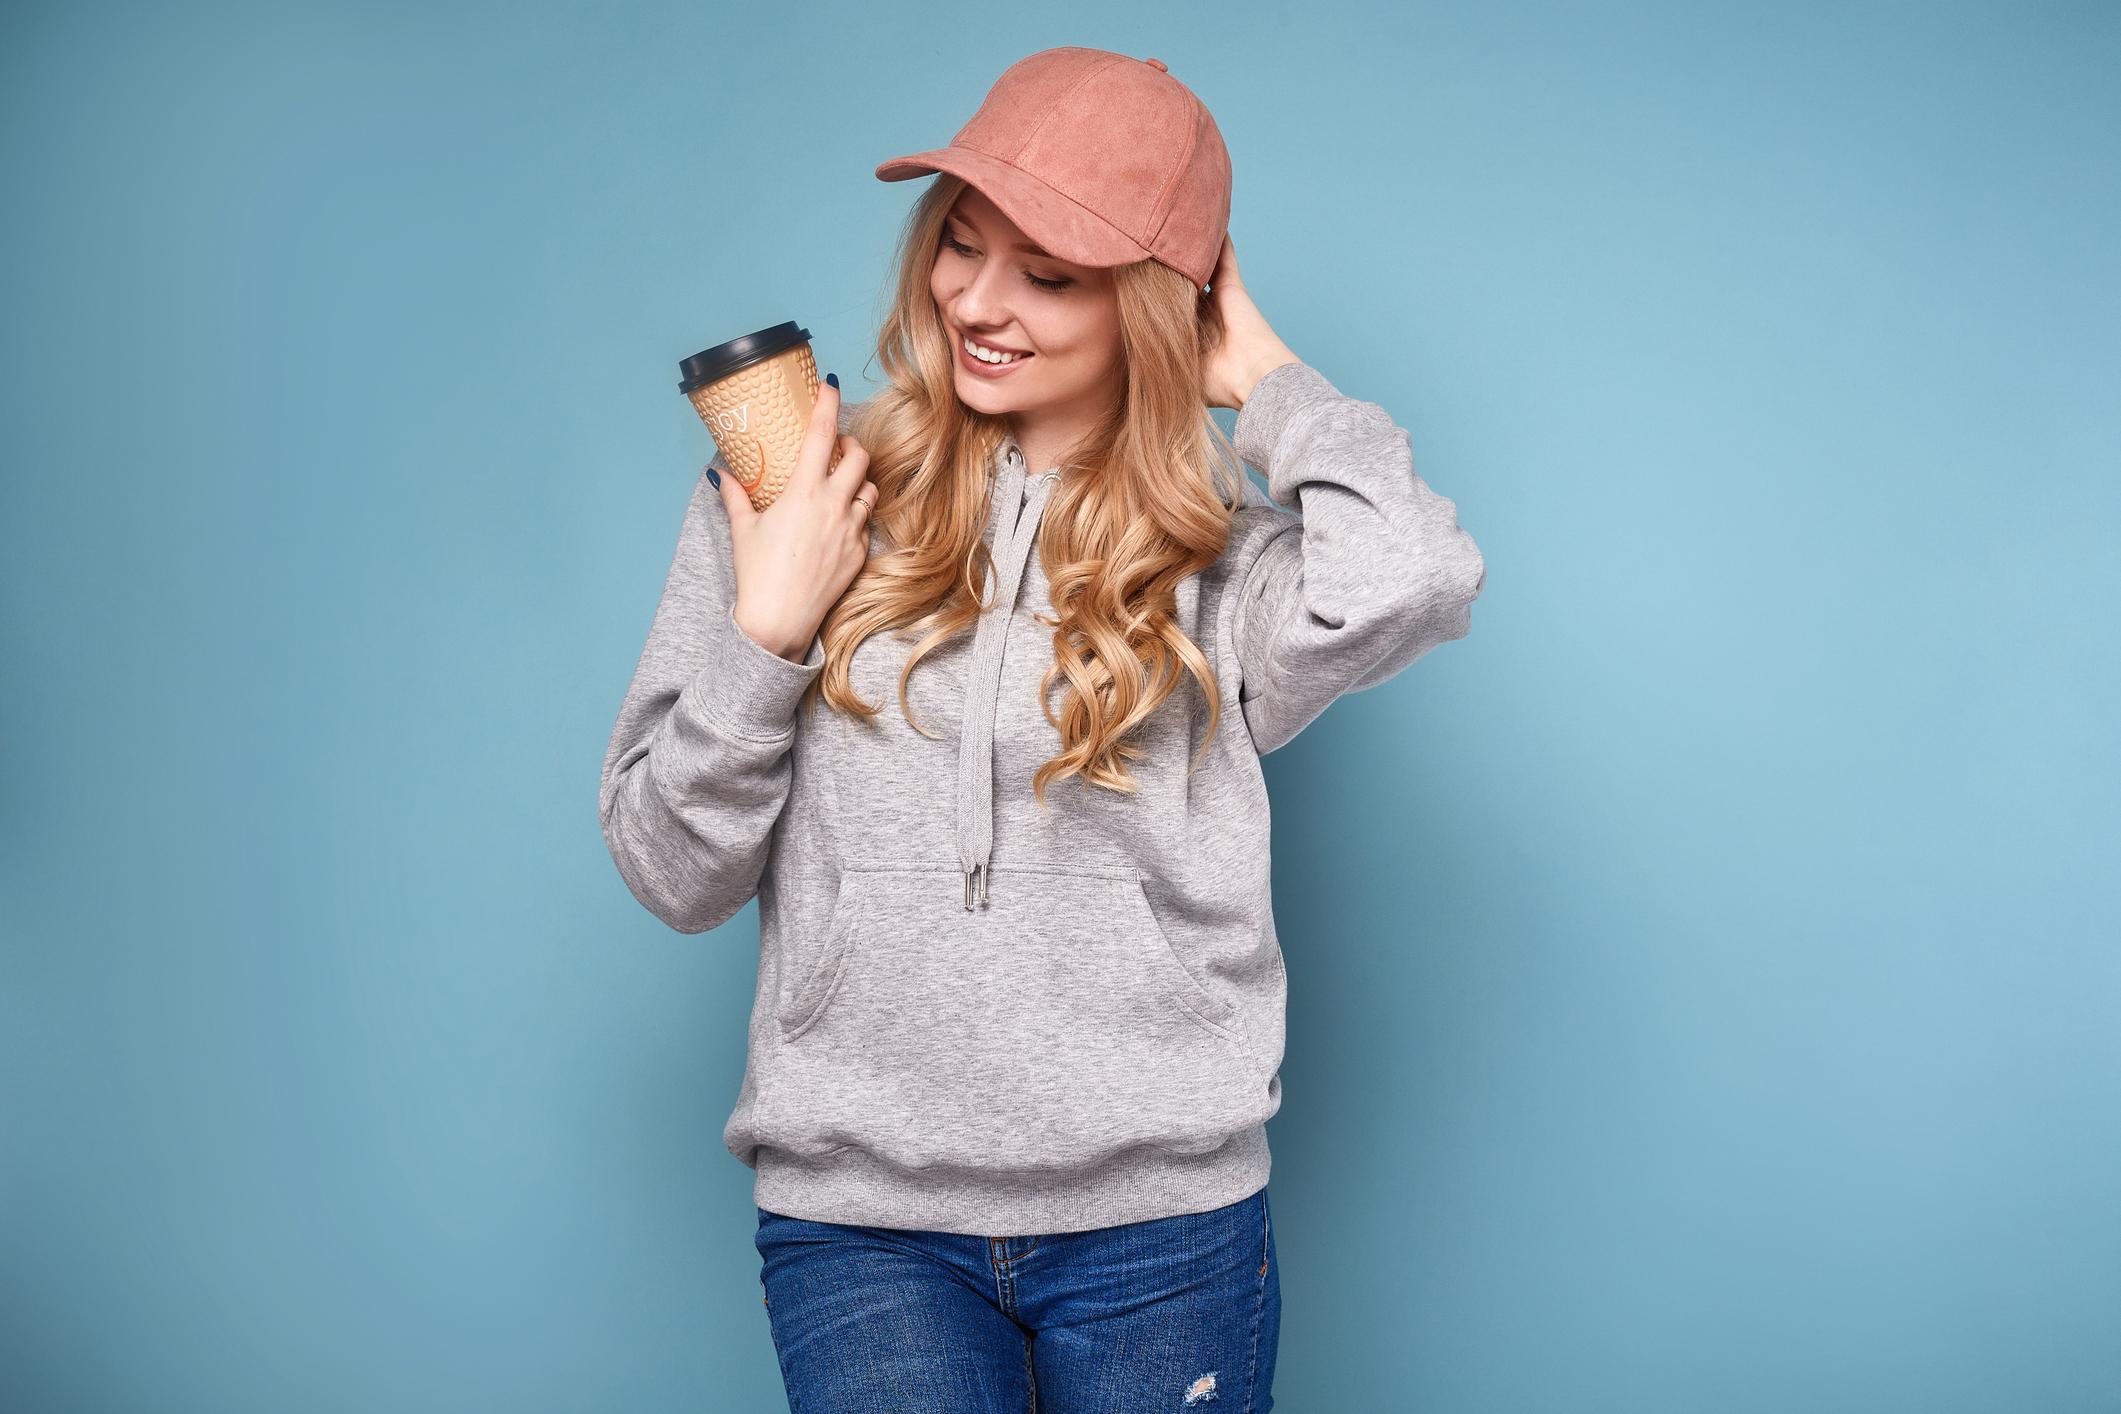 5 Tips for Designing Your Own Custom Hoodie   Freshly Baked Tees Blog